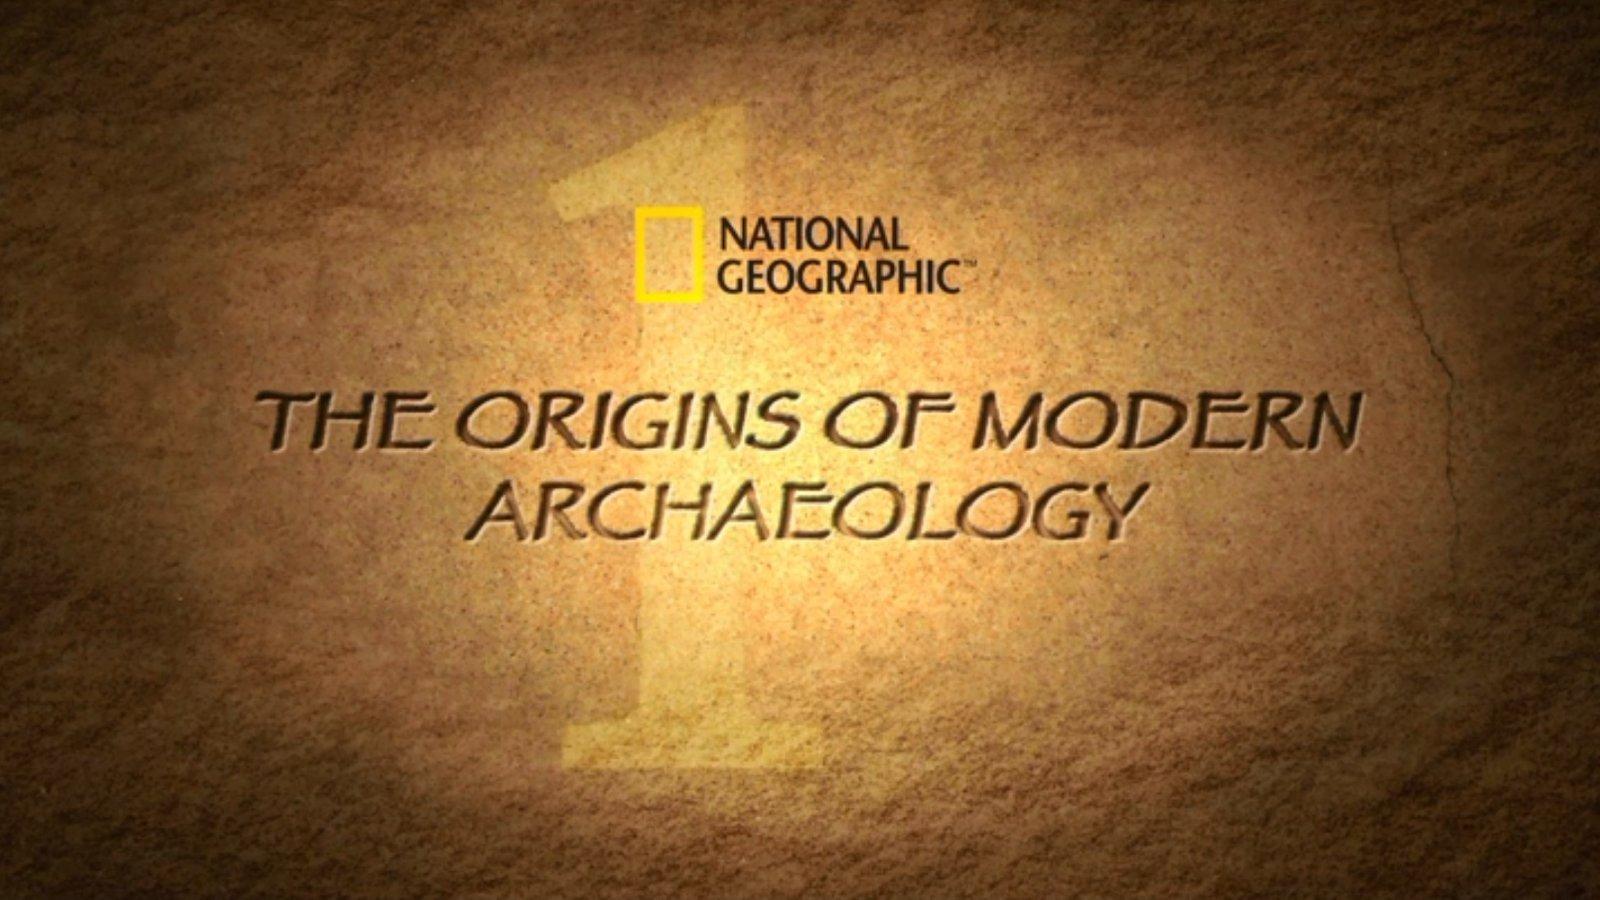 The Origins of Modern Archaeology